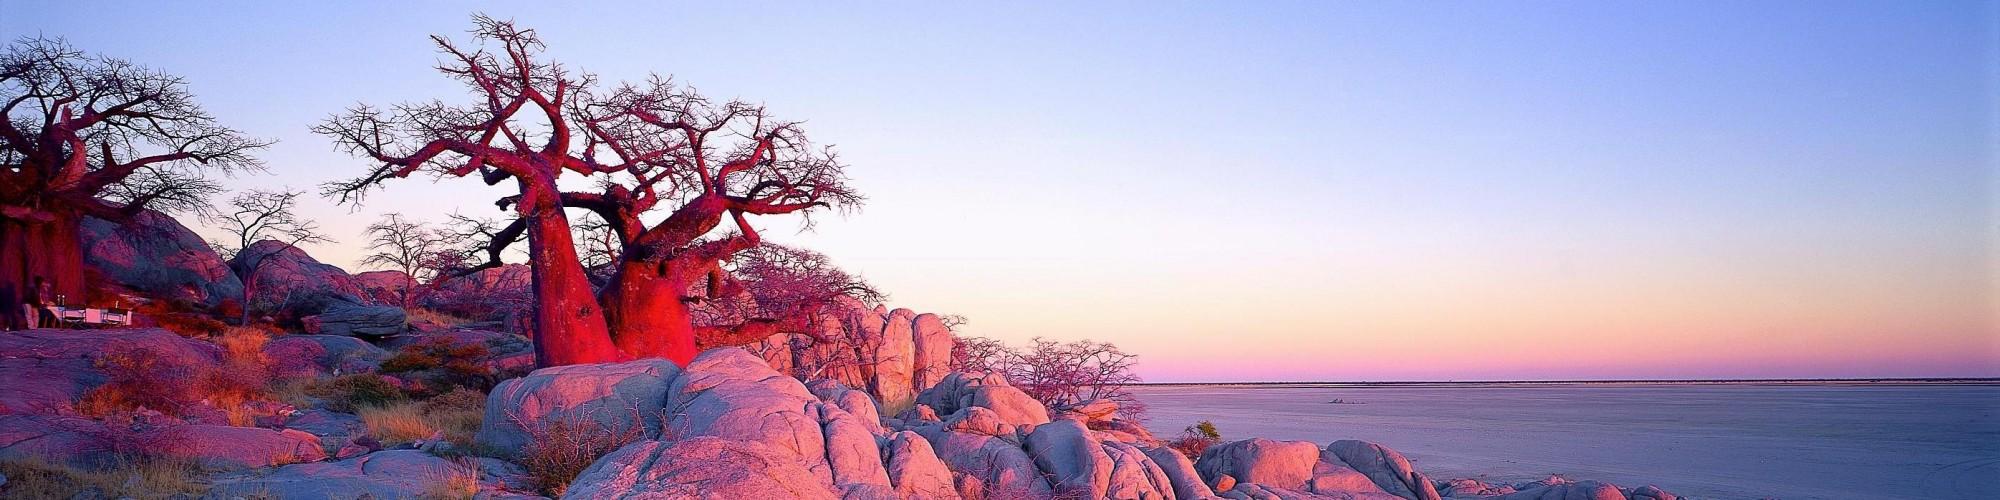 Stunted pink baobab, Botswana